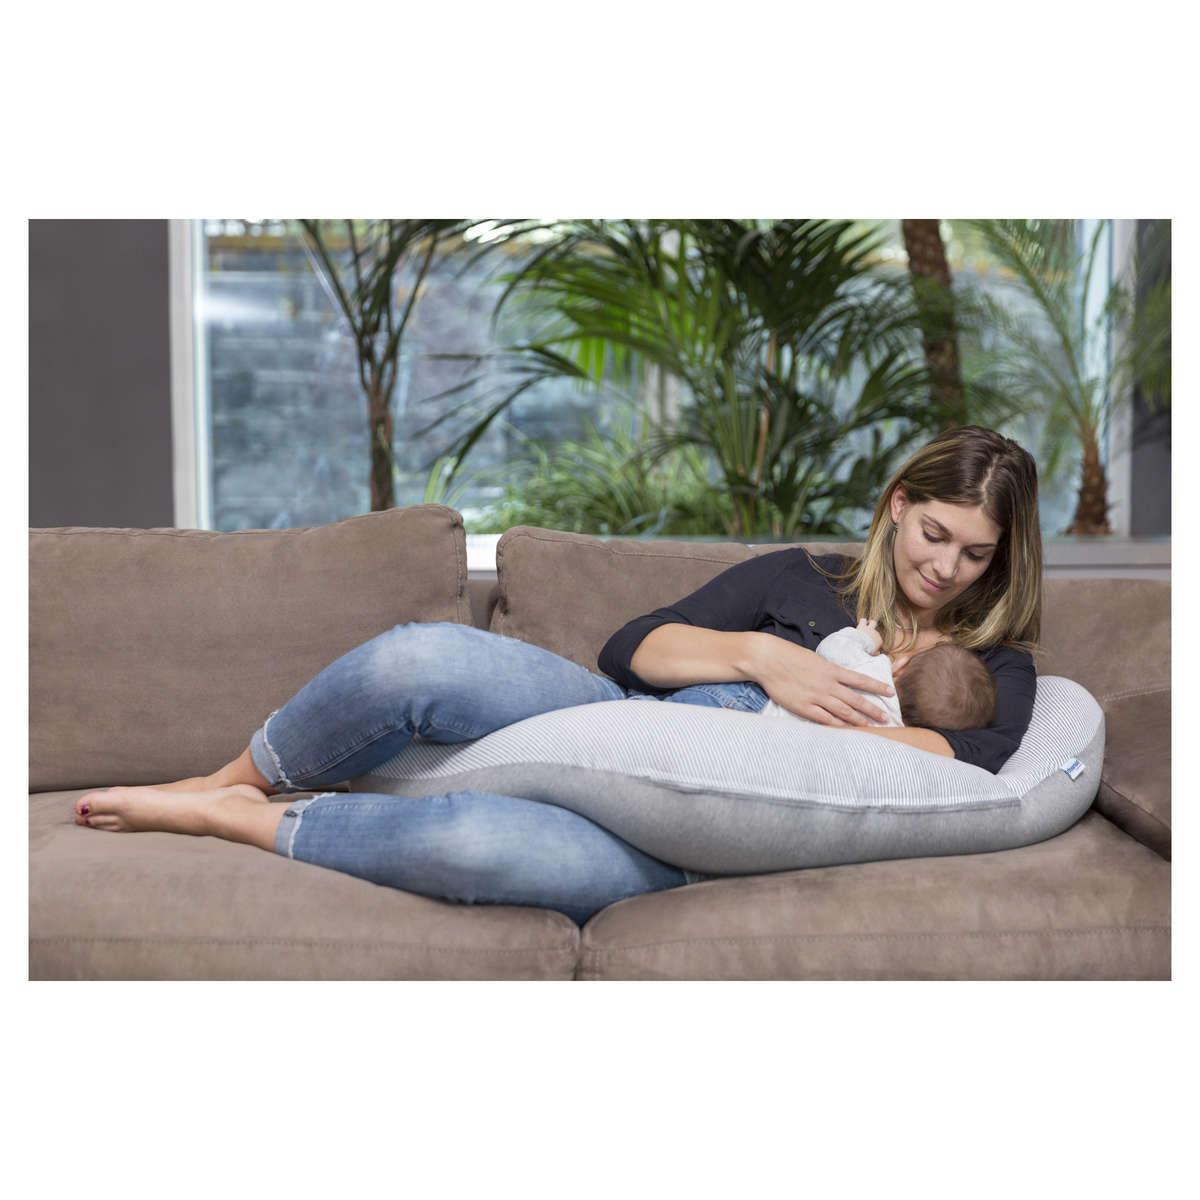 babymoov coussin de maternit doomoo classic grey coussin allaitement babymoov sur l 39 armoire. Black Bedroom Furniture Sets. Home Design Ideas